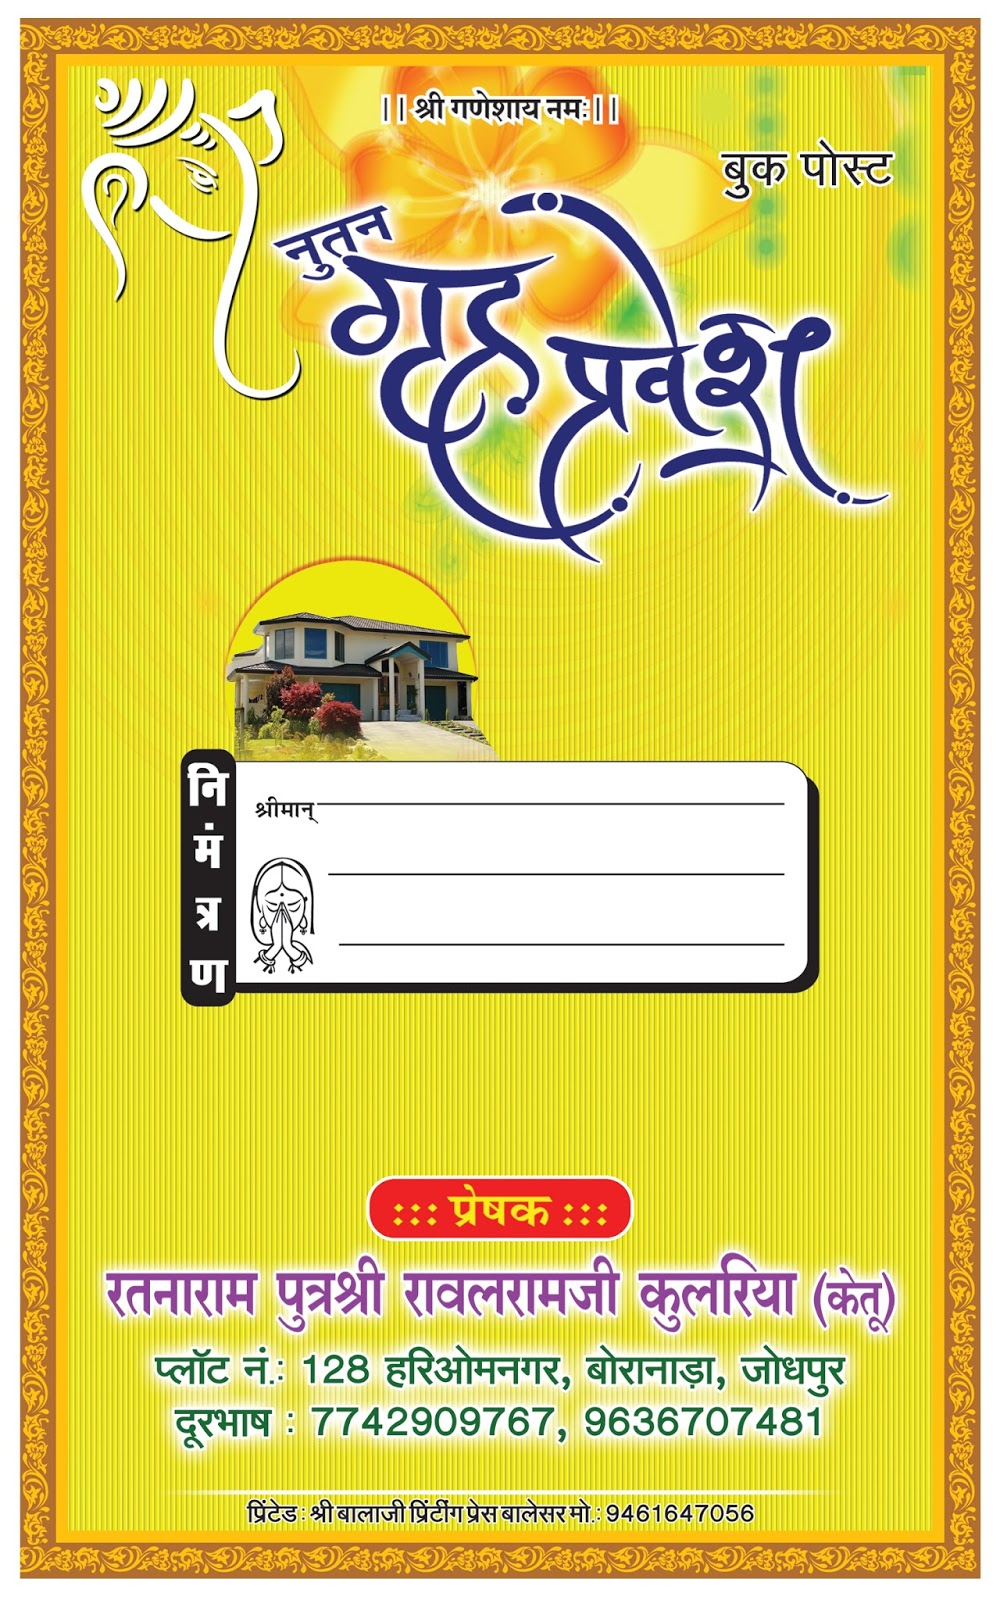 housewarming invitation card template free download ...